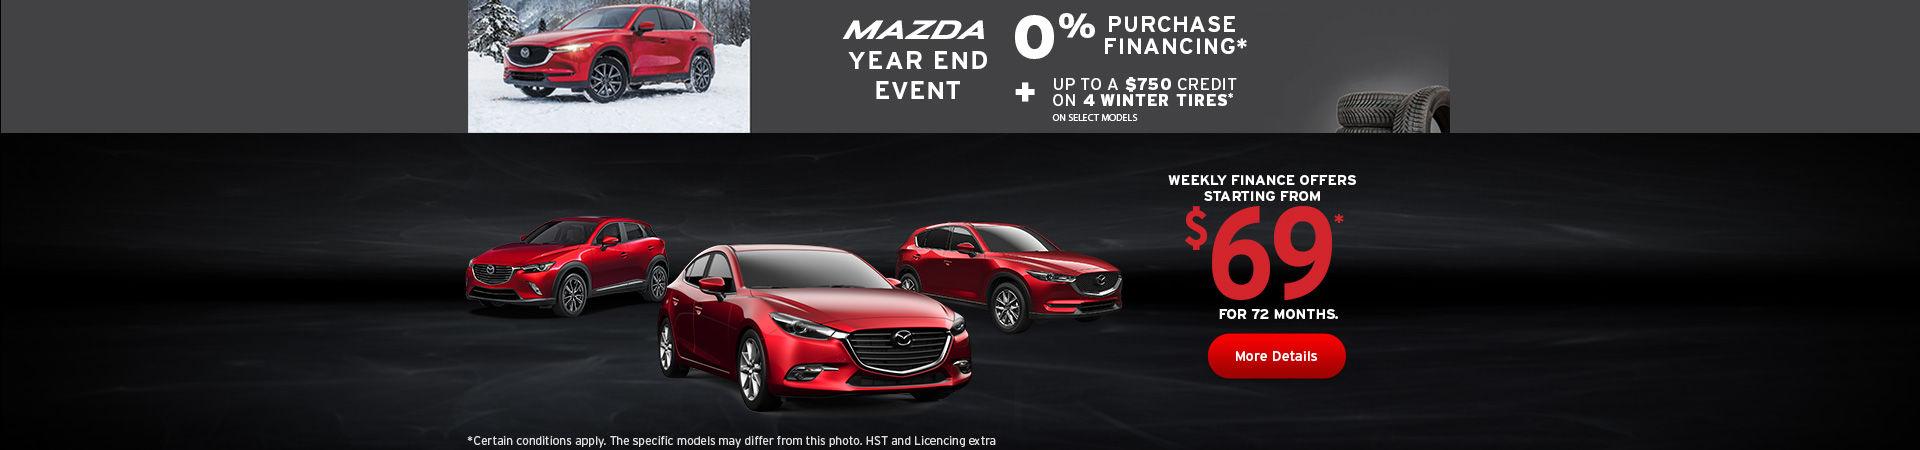 Mazda year end Event  - header